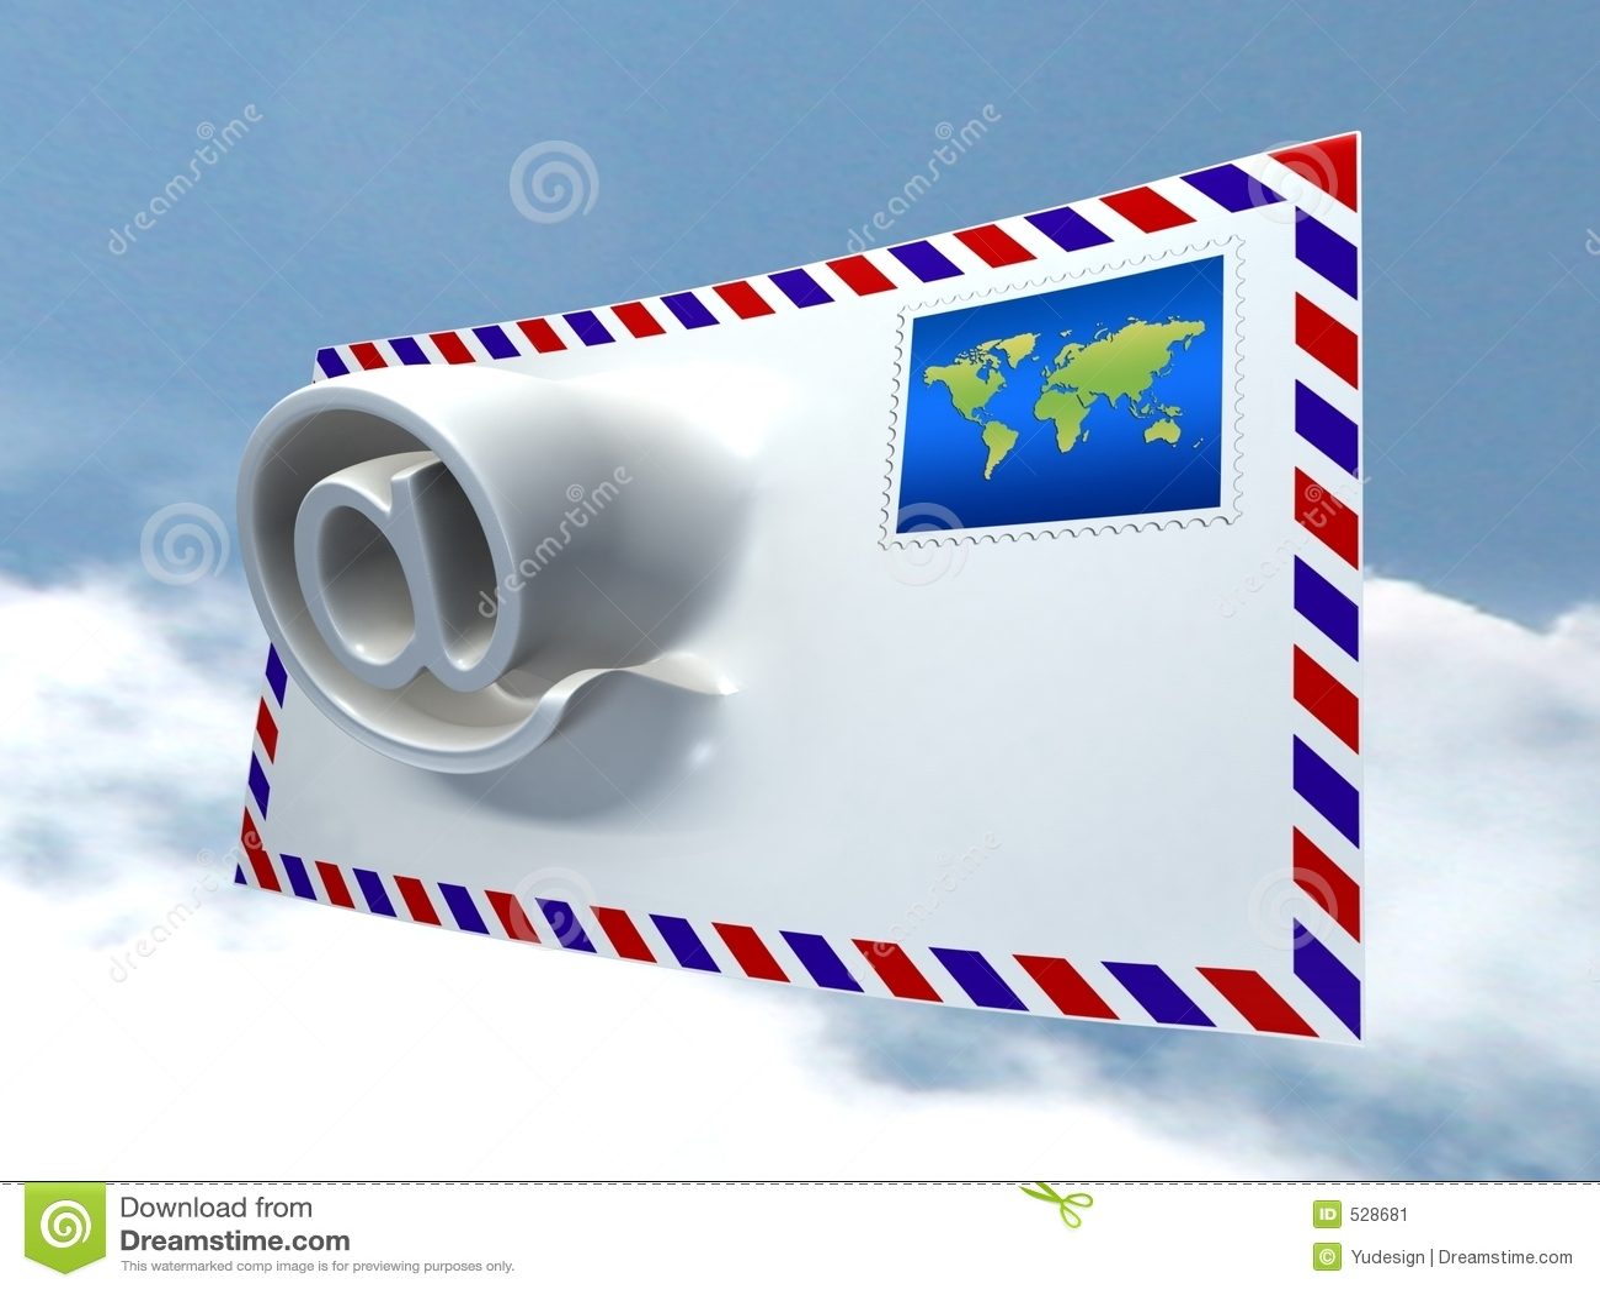 Download 邮件变体 库存例证. 插画 包括有 互联网, 办公室, 查出, 发送同样的消息到多个新闻组, 纸张, 翻译, 变体 - 528681